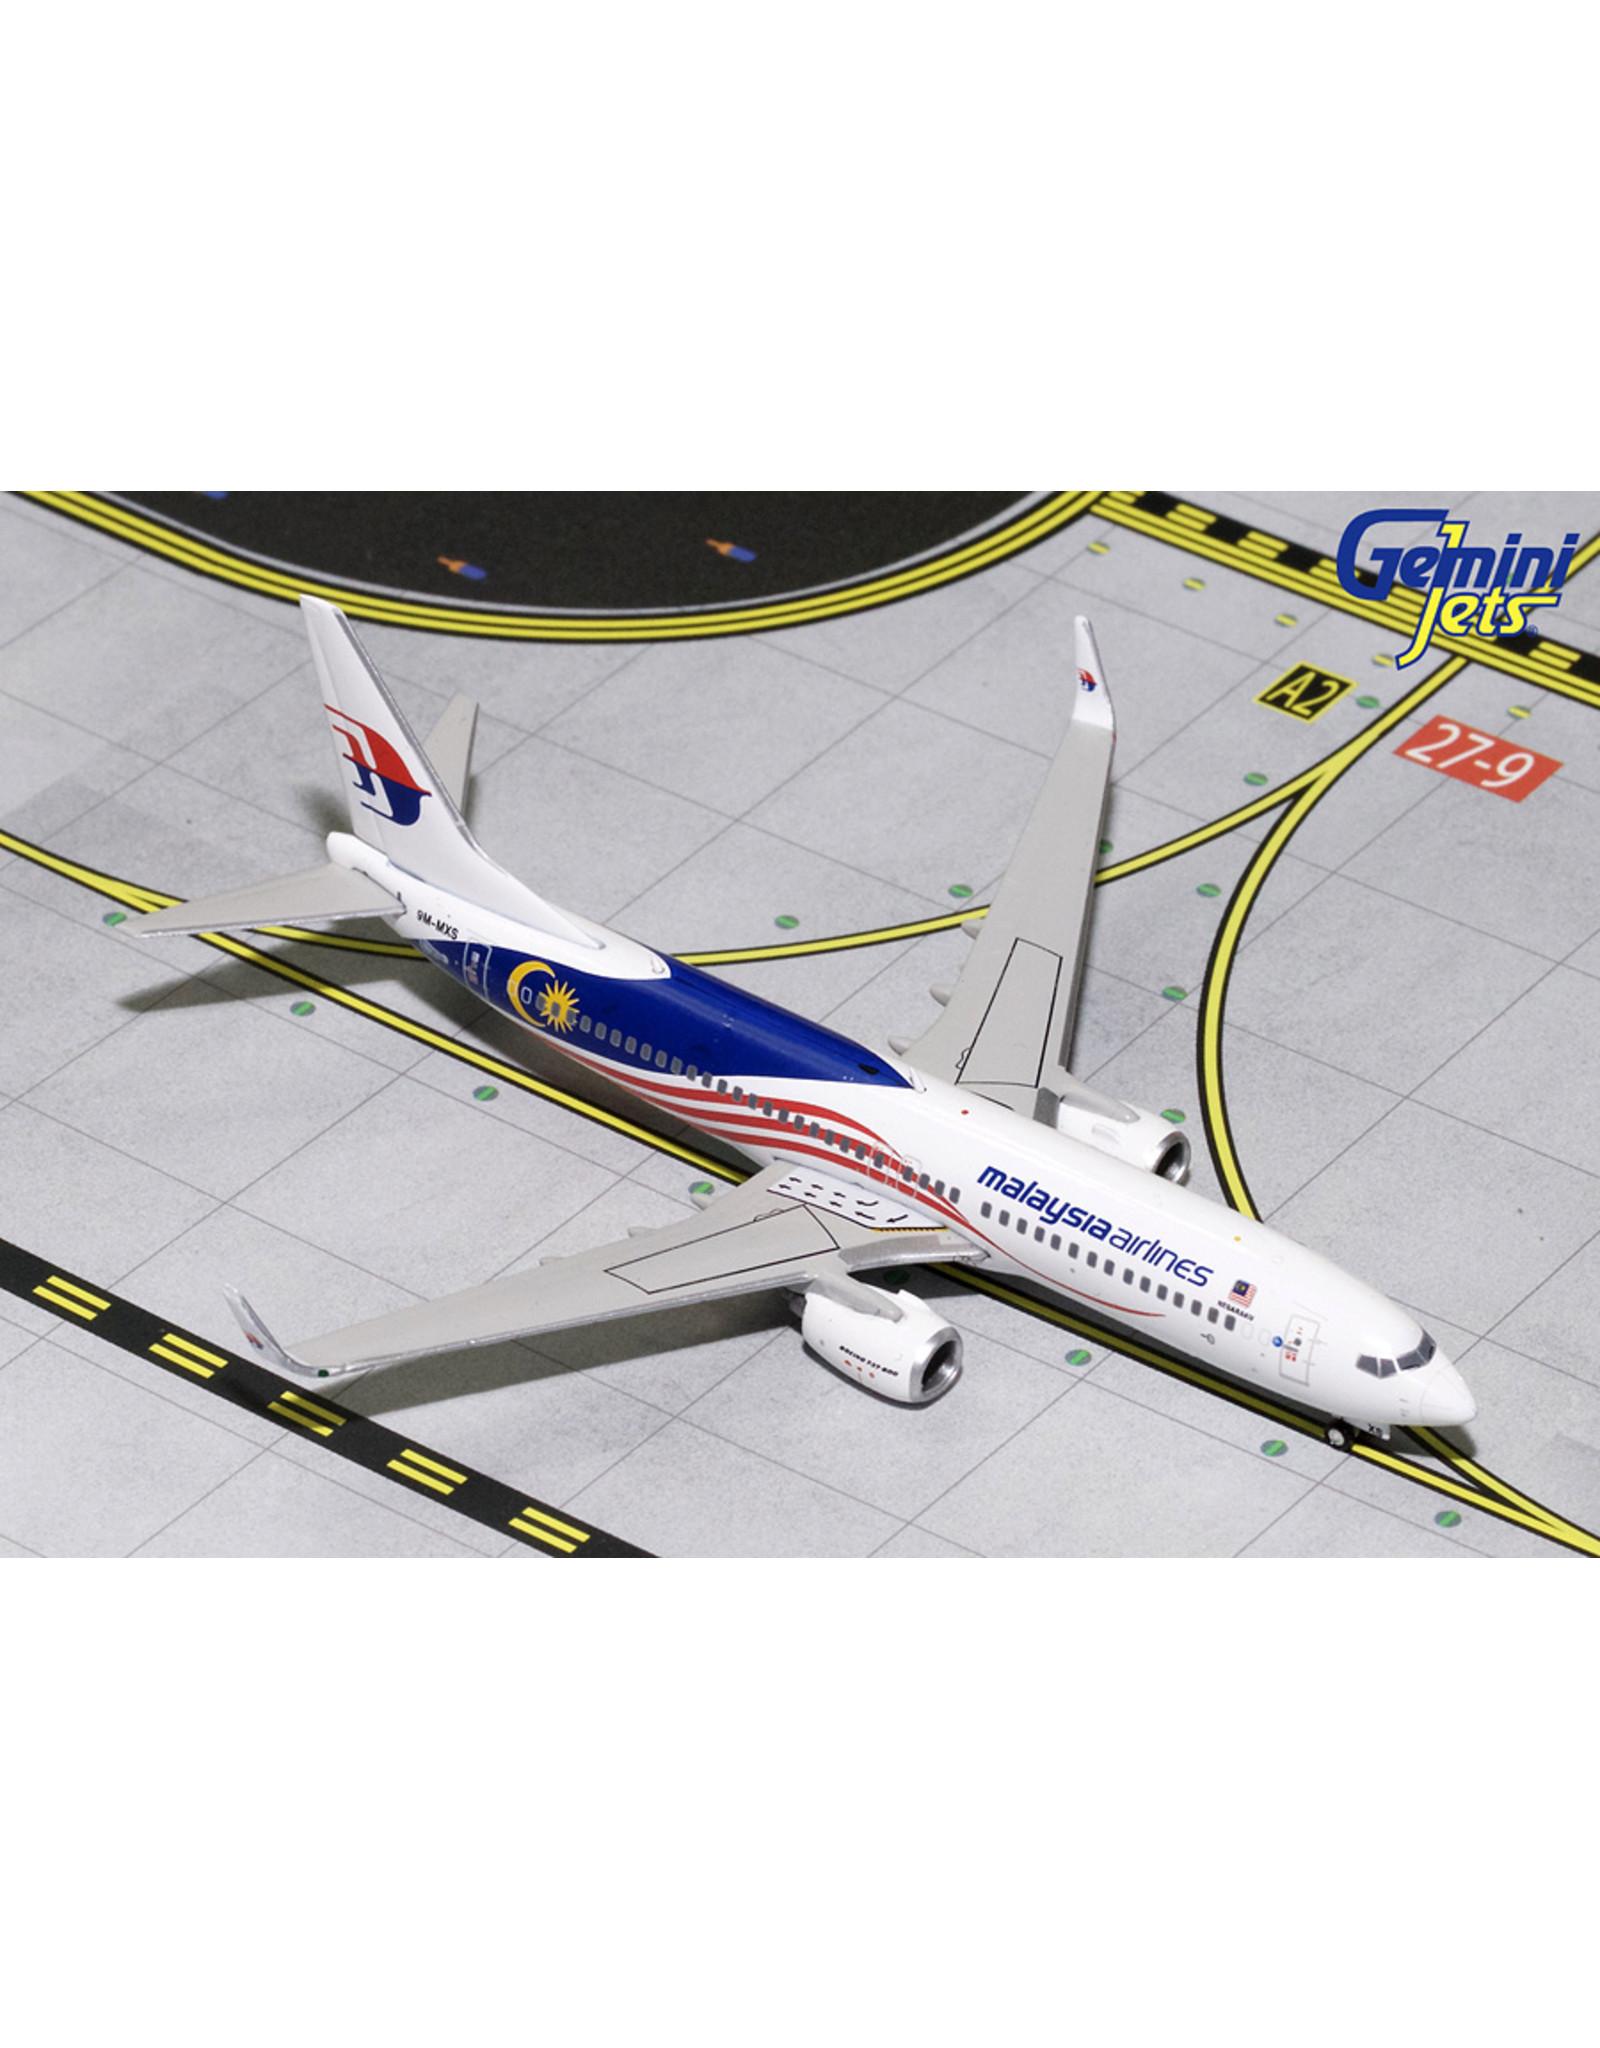 Gemini Gem4 Malaysia 737-800w